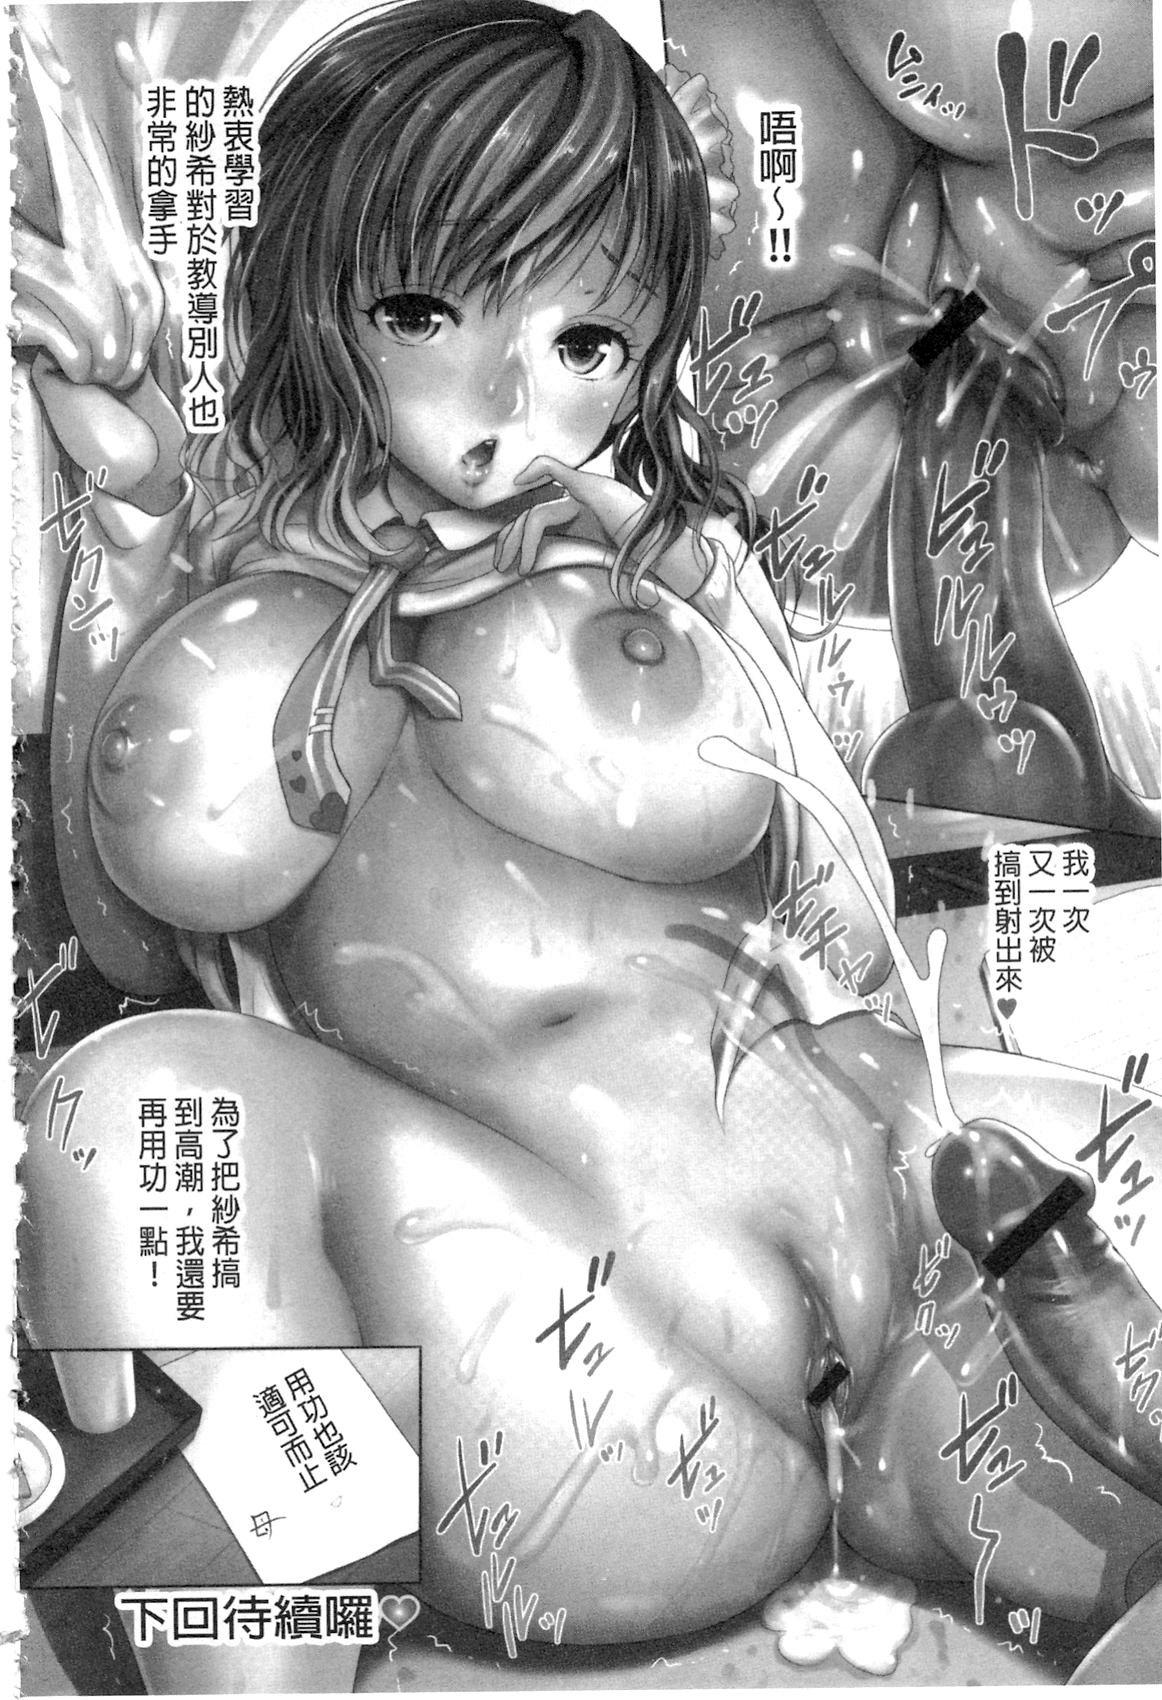 Yawahada Otome | 柔嫩肌膚的乙女 16